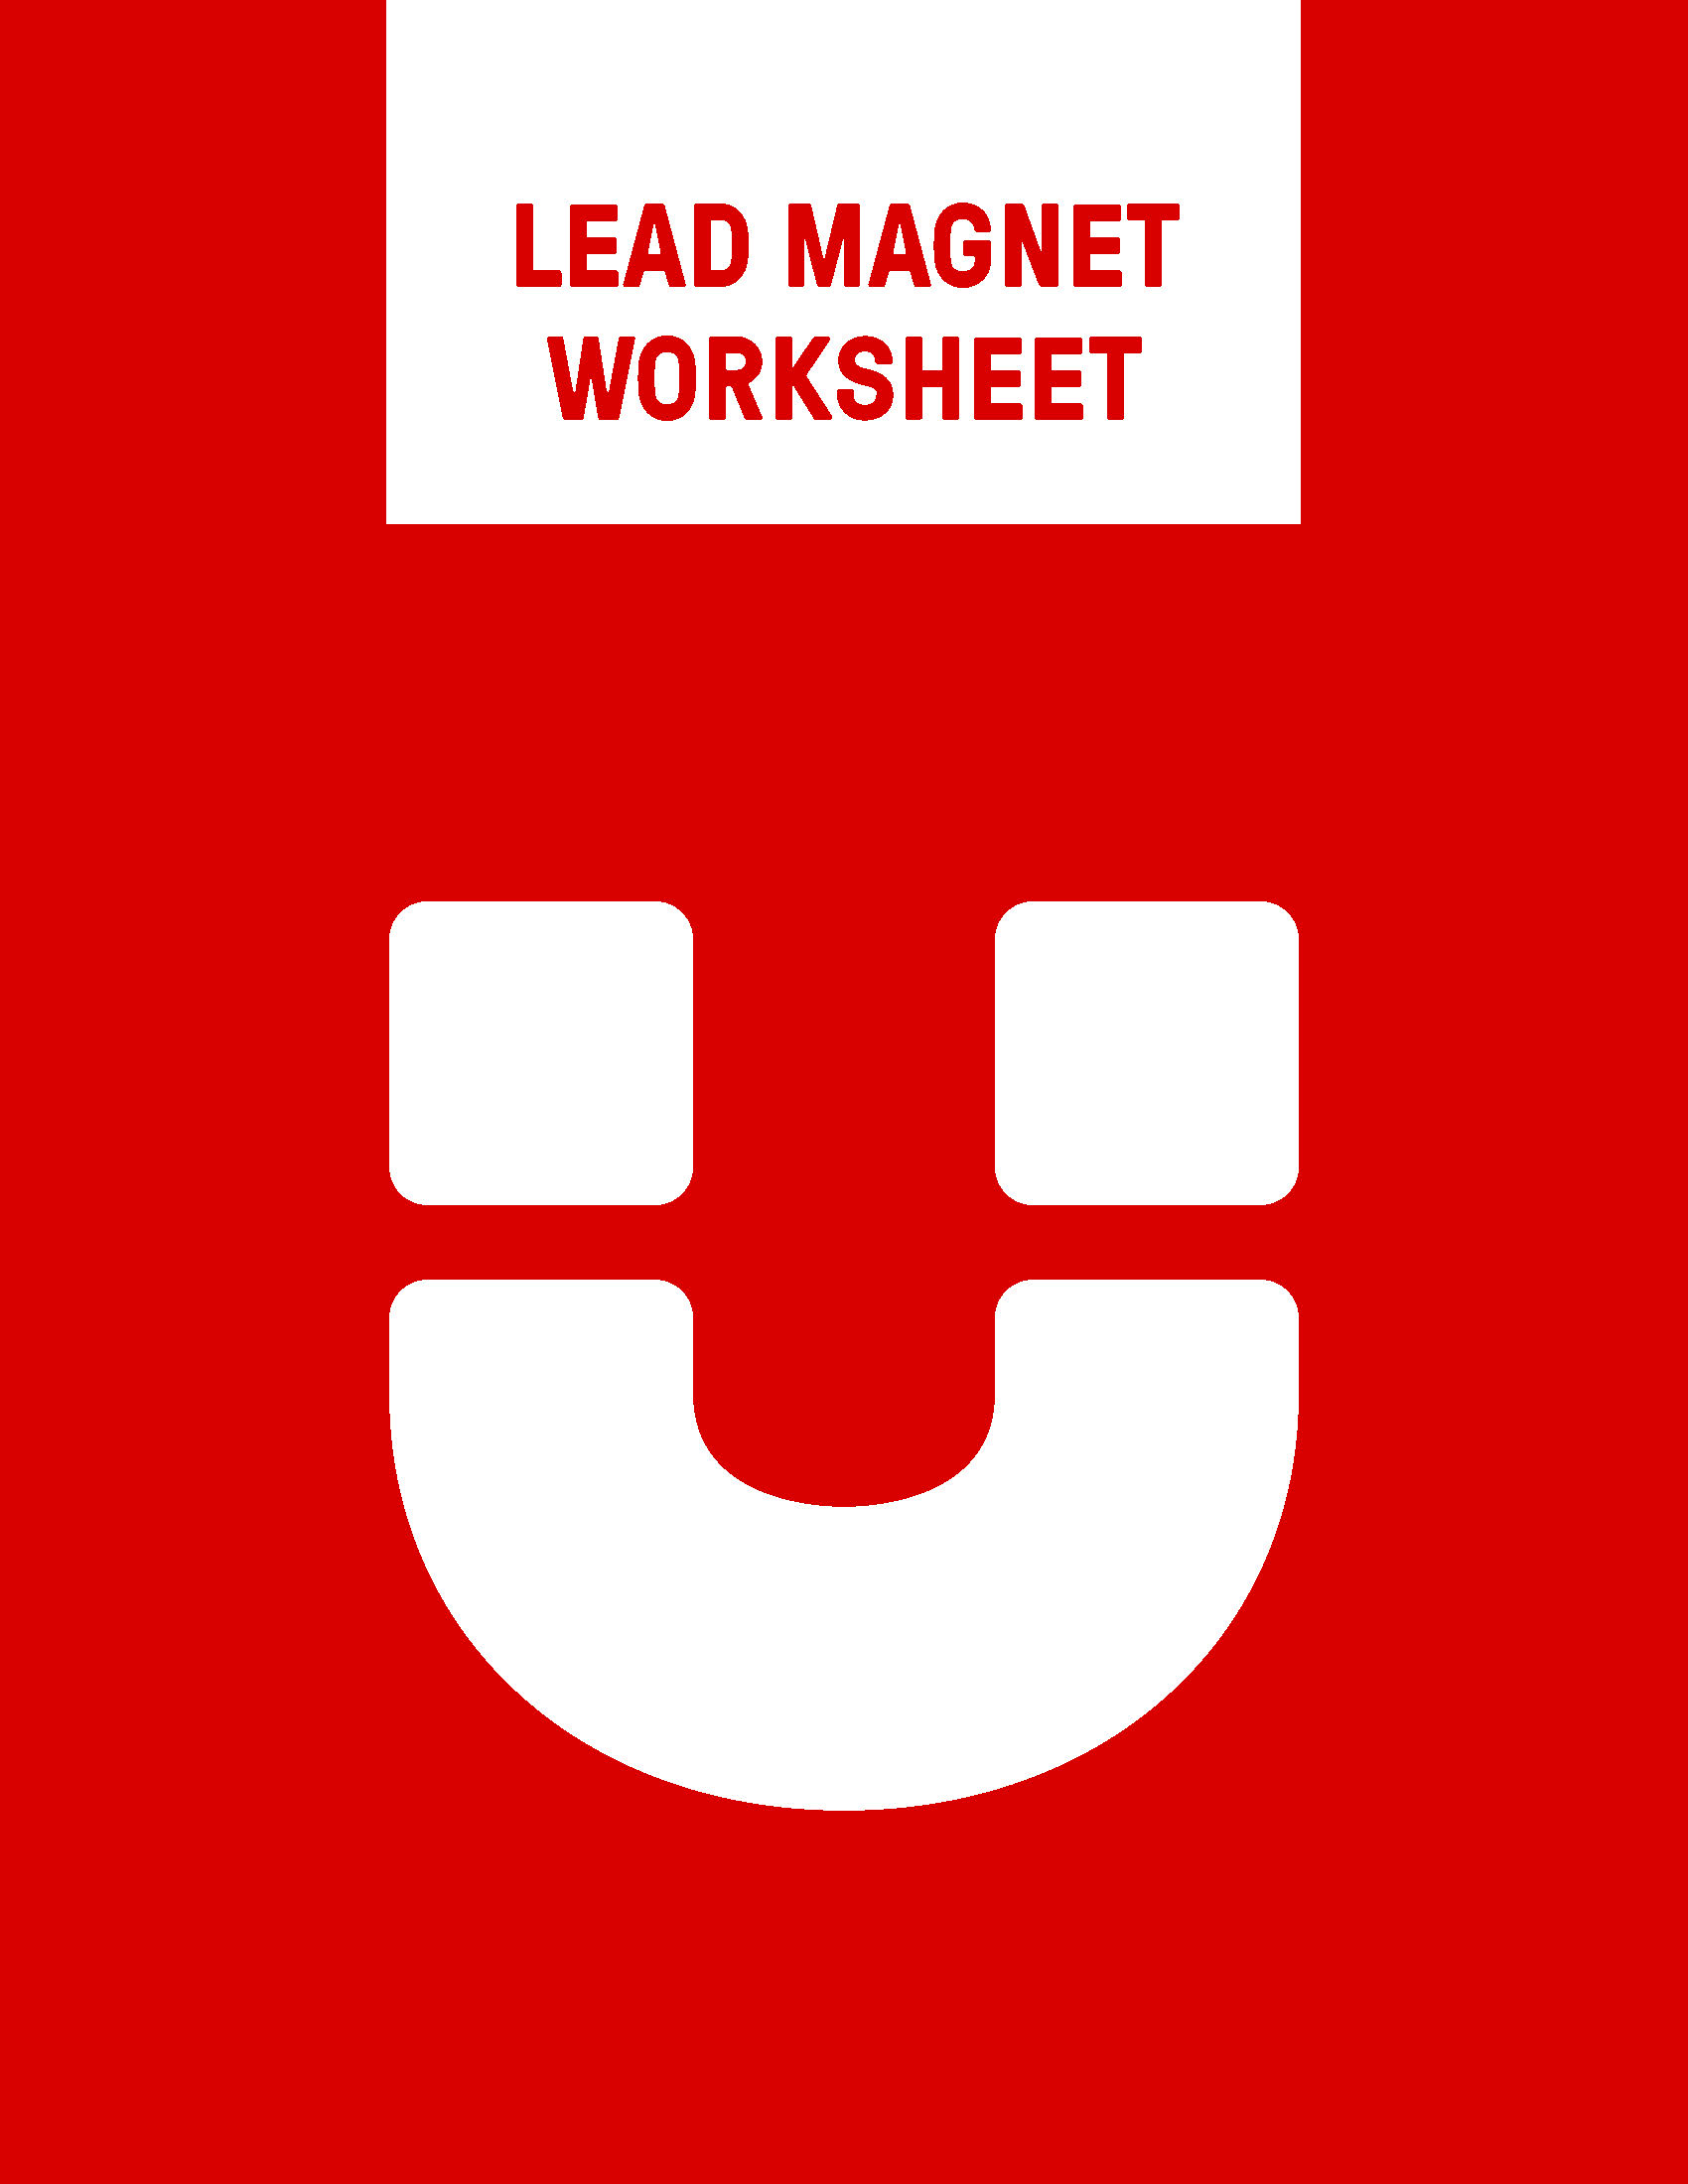 Lead Magnet Worksheet Infusionmedia